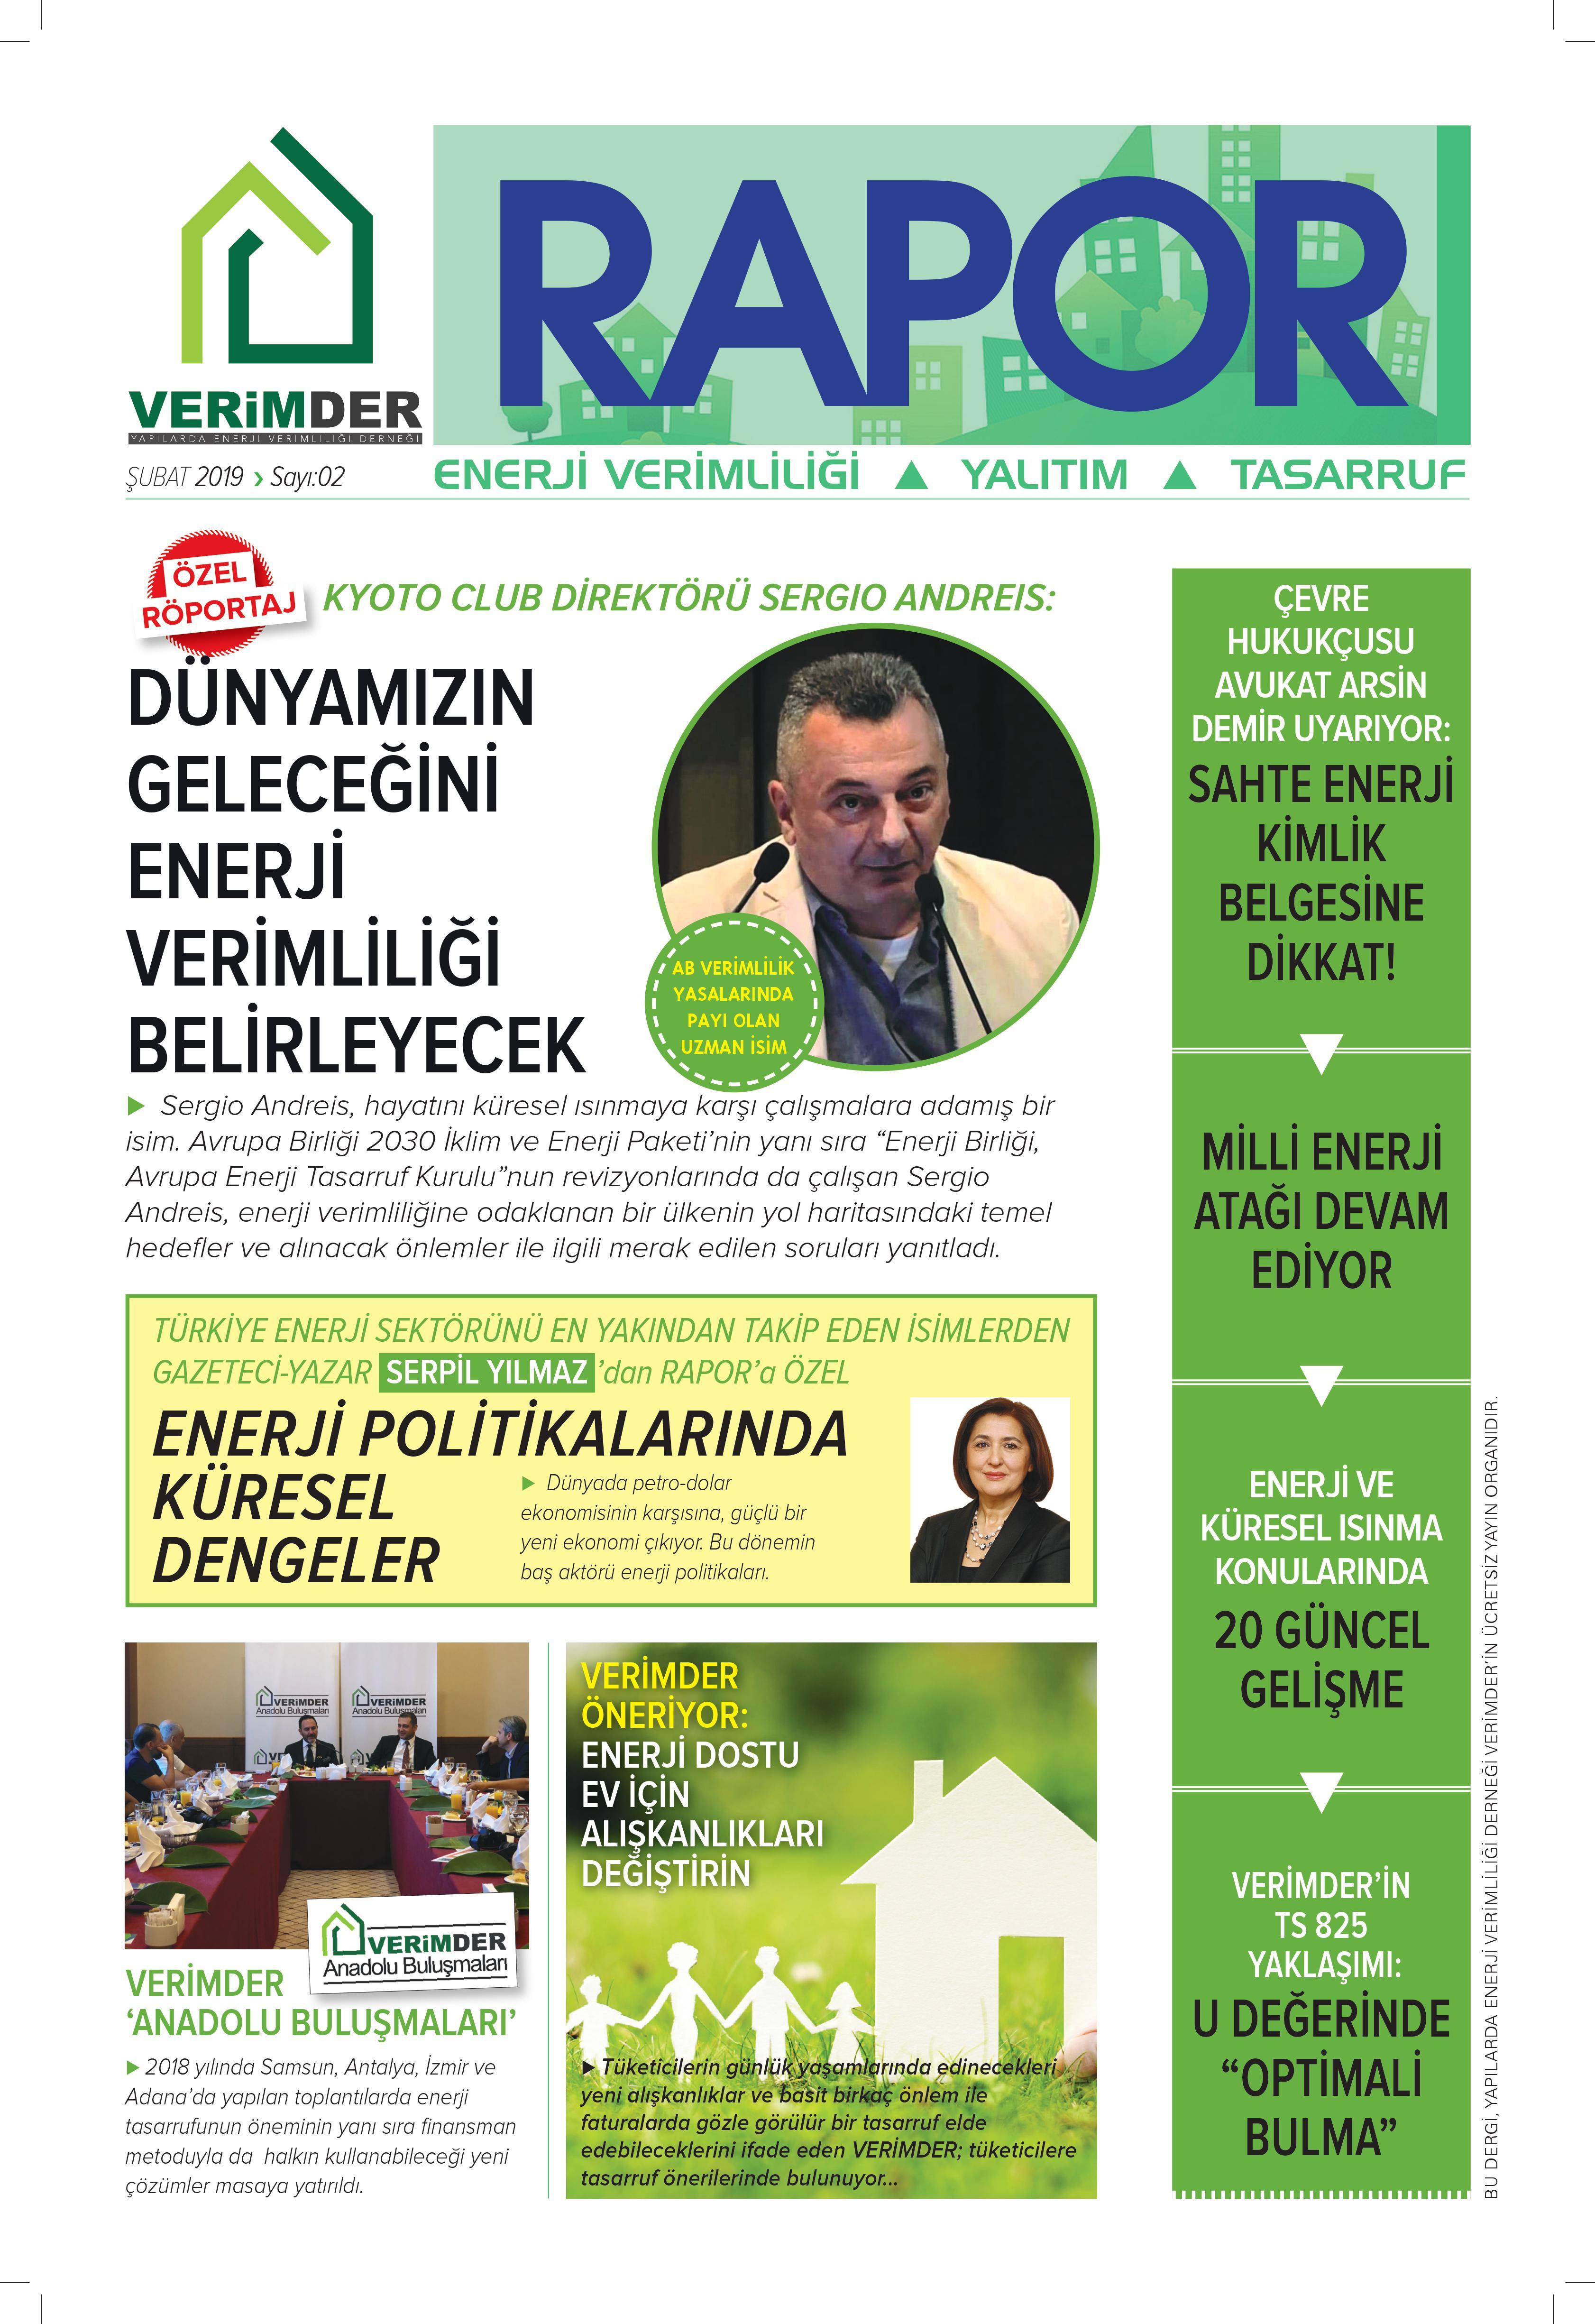 VERİMDER RAPOR DERGİSİNİN 2. SAYISI YAYINDA!